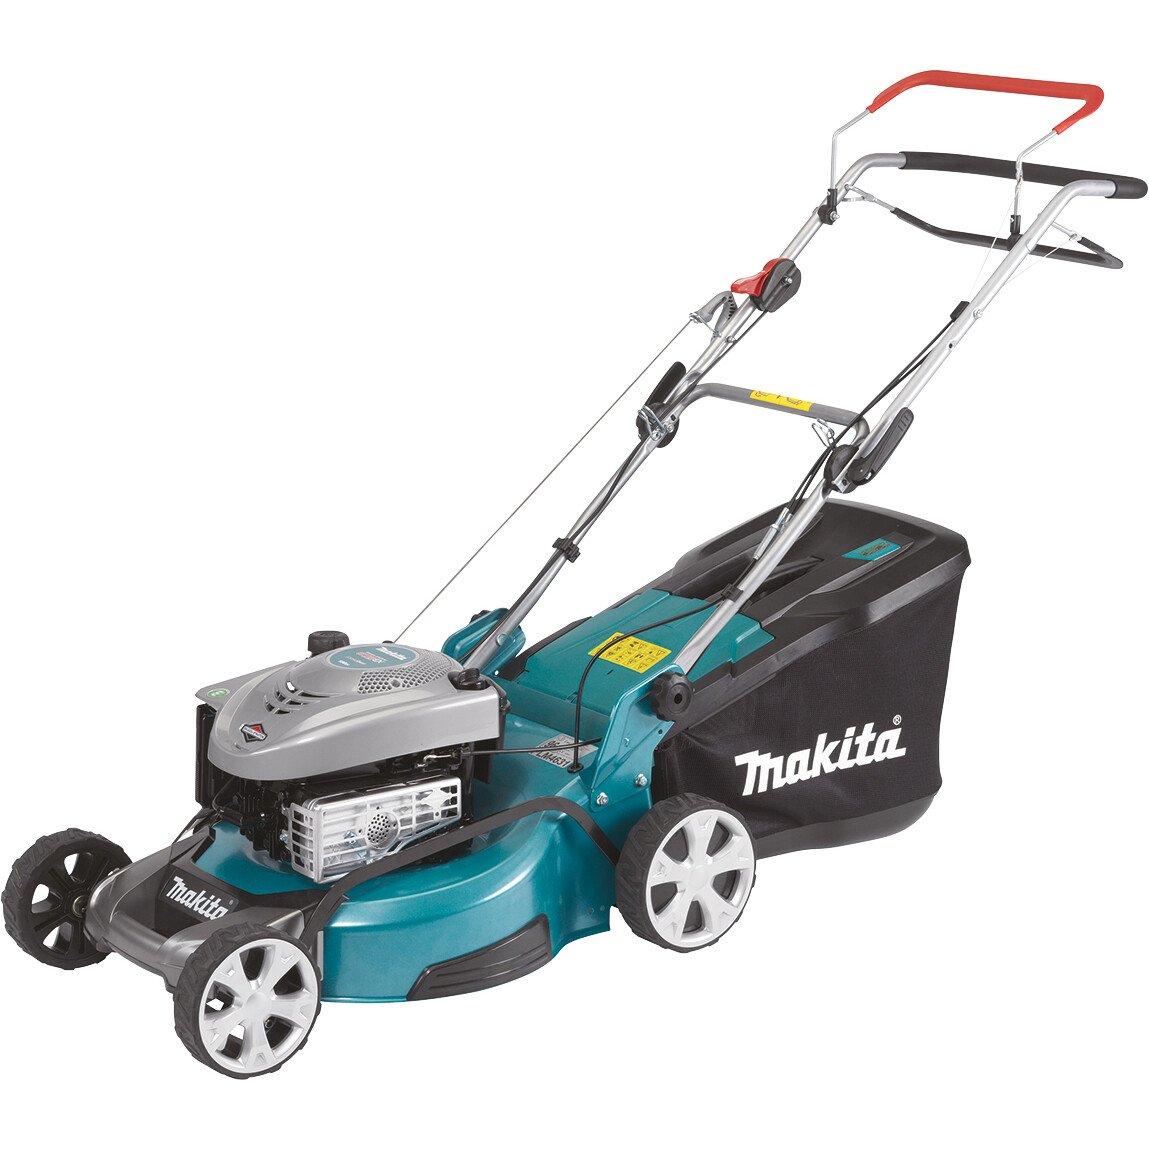 Makita PLM4631N 190cc 4-stroke Petrol Lawn Mower